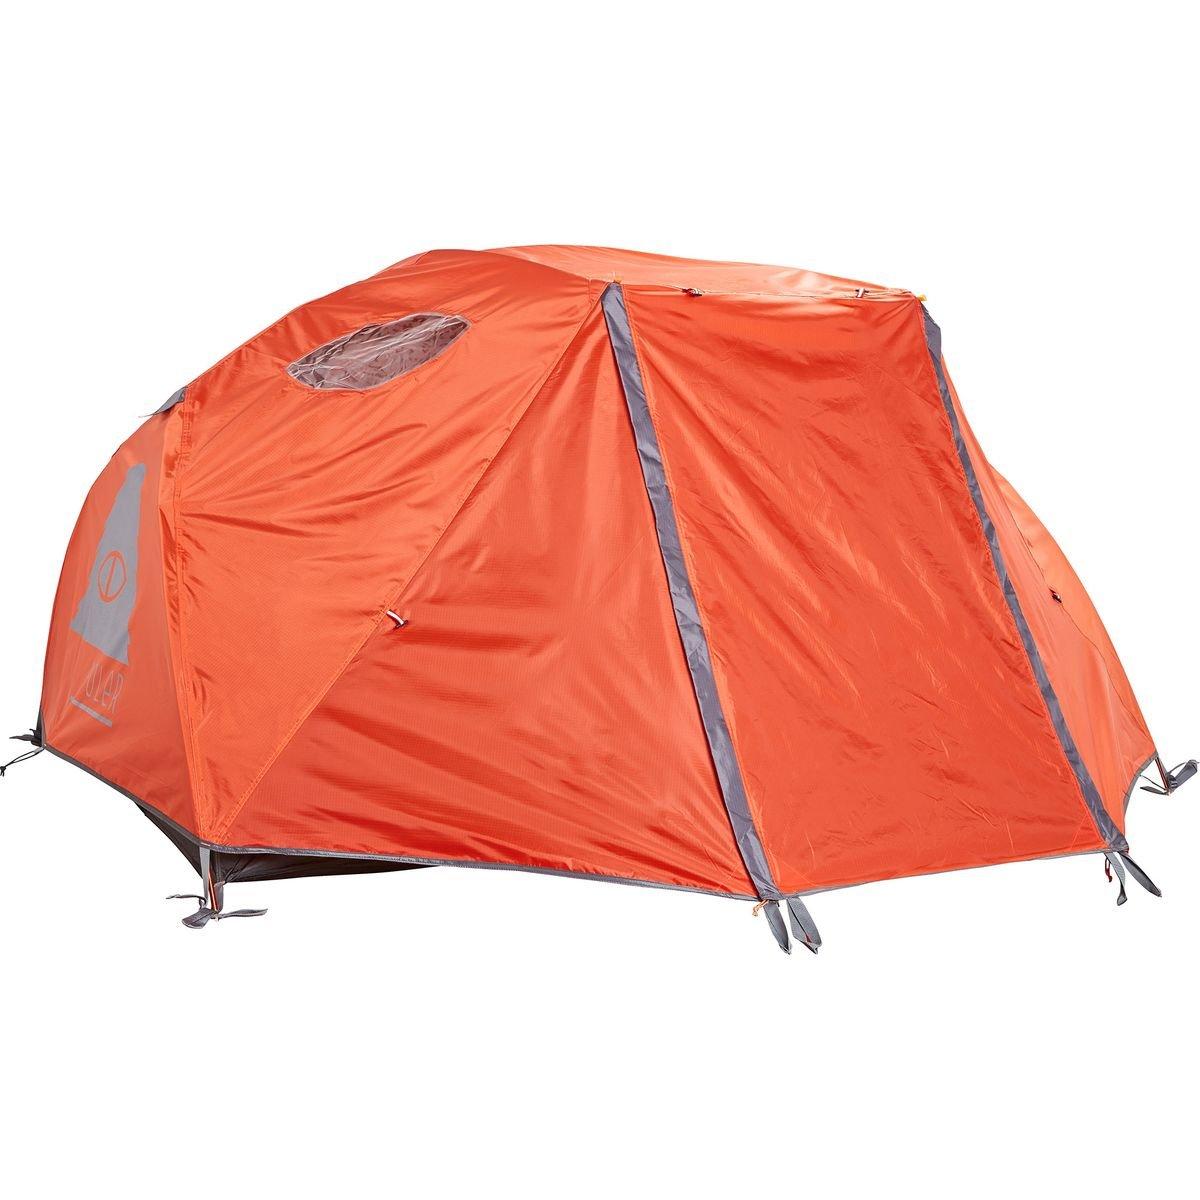 Poler 2 Man Tent One Size Burnt Orange